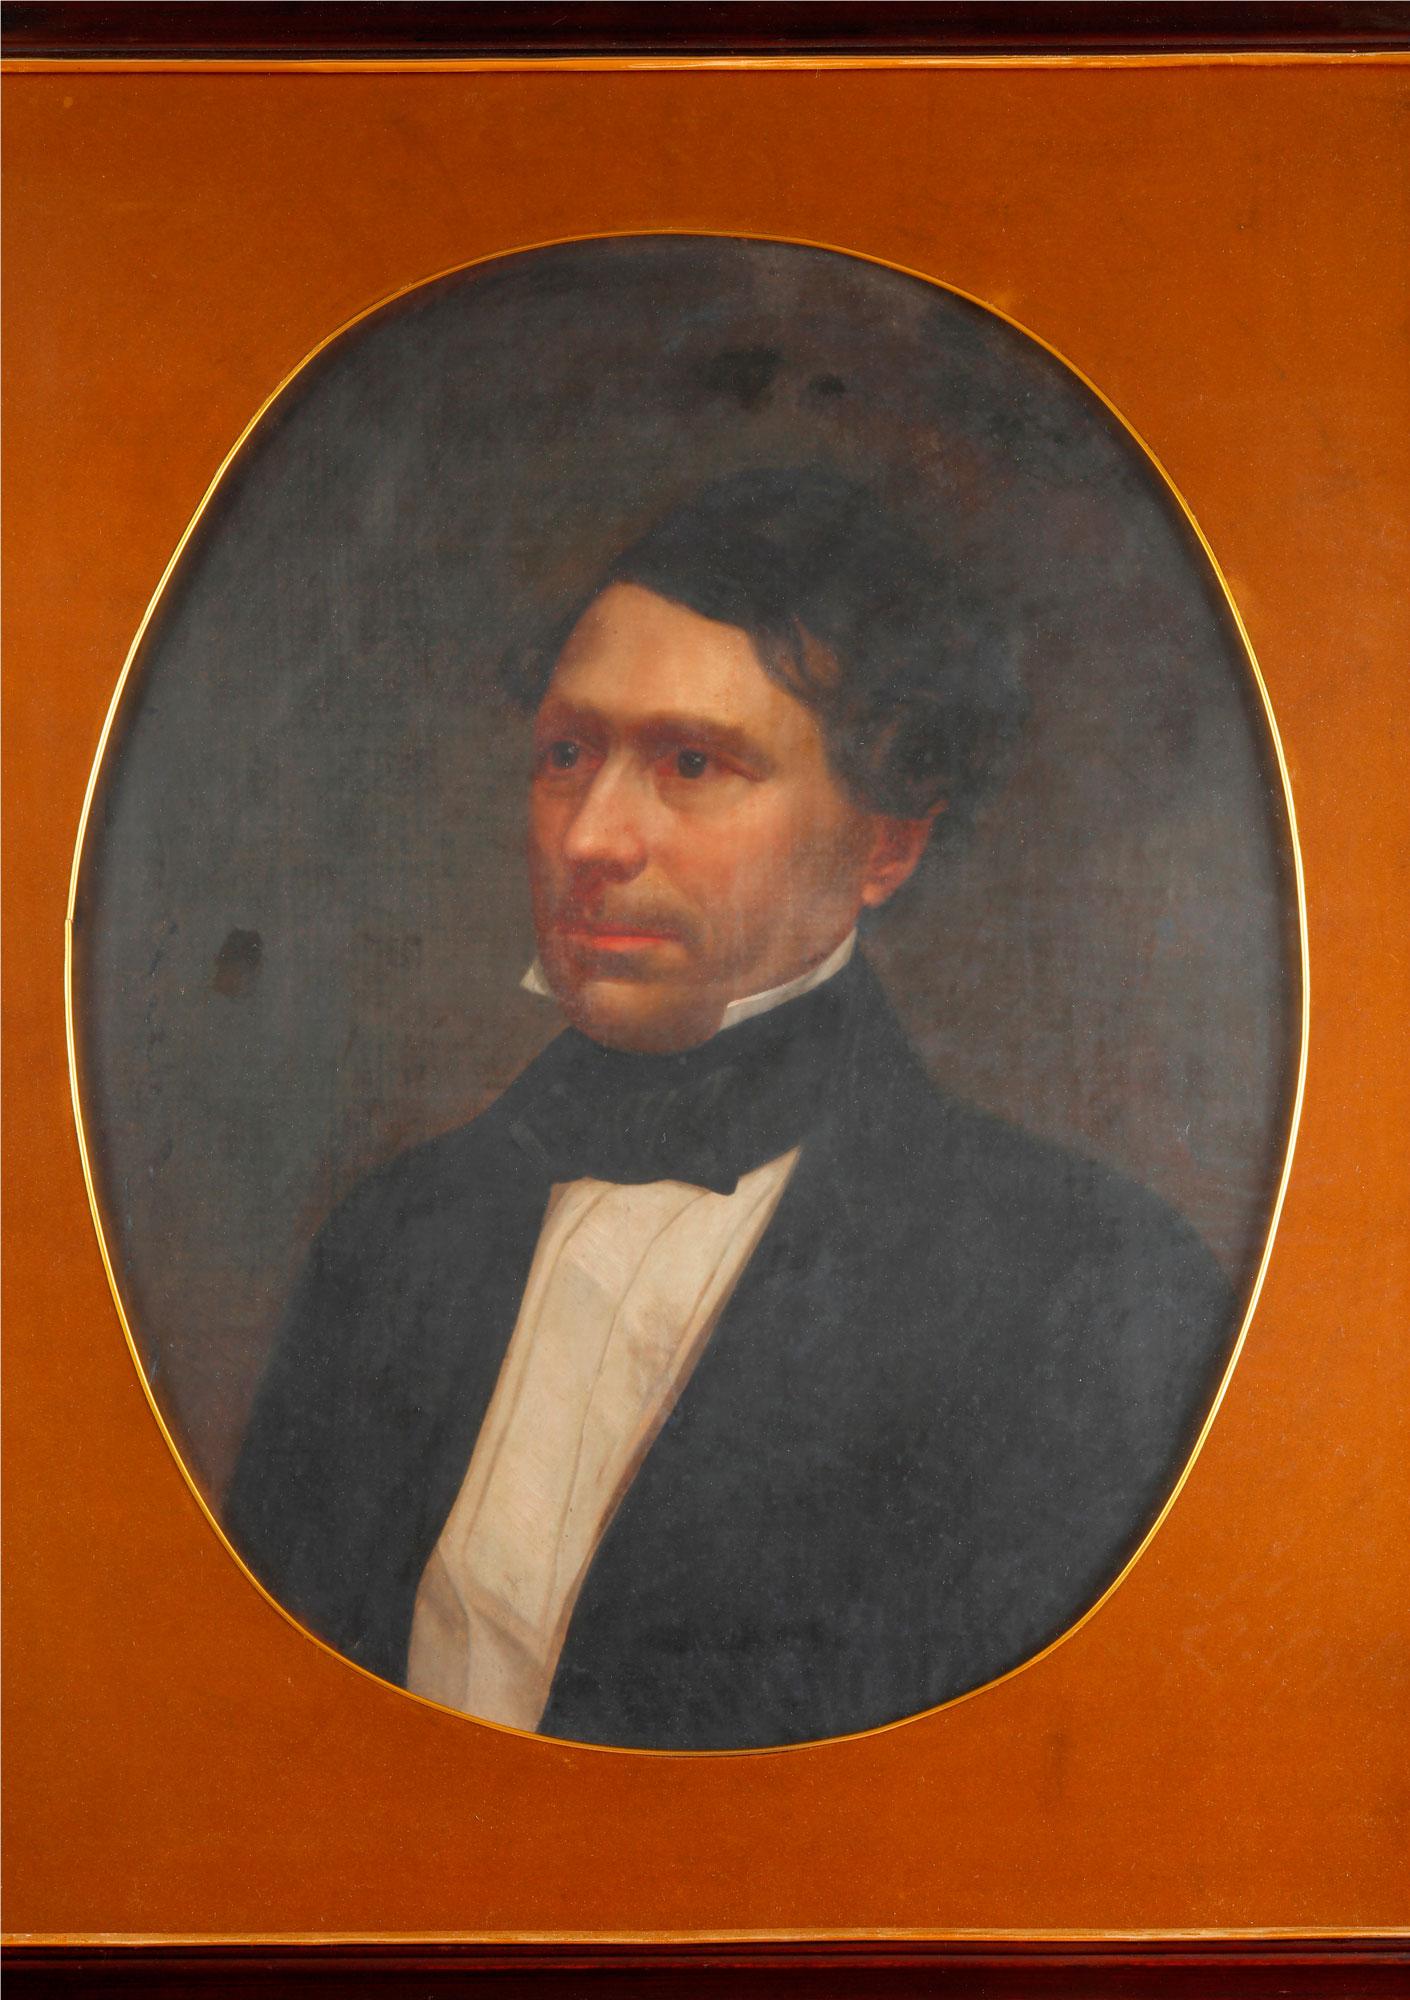 Portrait of Franklin Pierce Unknown Artist Gift from President Franklin Pierce to Second King Pinklao, 1856 98 x 84 cm Courtesy of the Fine Arts Department of Thailand  ภาพเหมือนประธานาธิบดีแฟรงกลิน เพียร์ซ ศิลปินไม่ทราบชื่อ ของขวัญจากประธานาธิบดีแฟรงกลิน เพียร์ซ ทูลเกล้าฯ ถวายแด่พระบาทสมเด็จพระปิ่นเกล้าเจ้าอยู่หัว พ.ศ. ๒๓๙๙ ๙๘ x ๘๔ ซม. ได้รับความอนุเคราะห์จากกรมศิลปากร